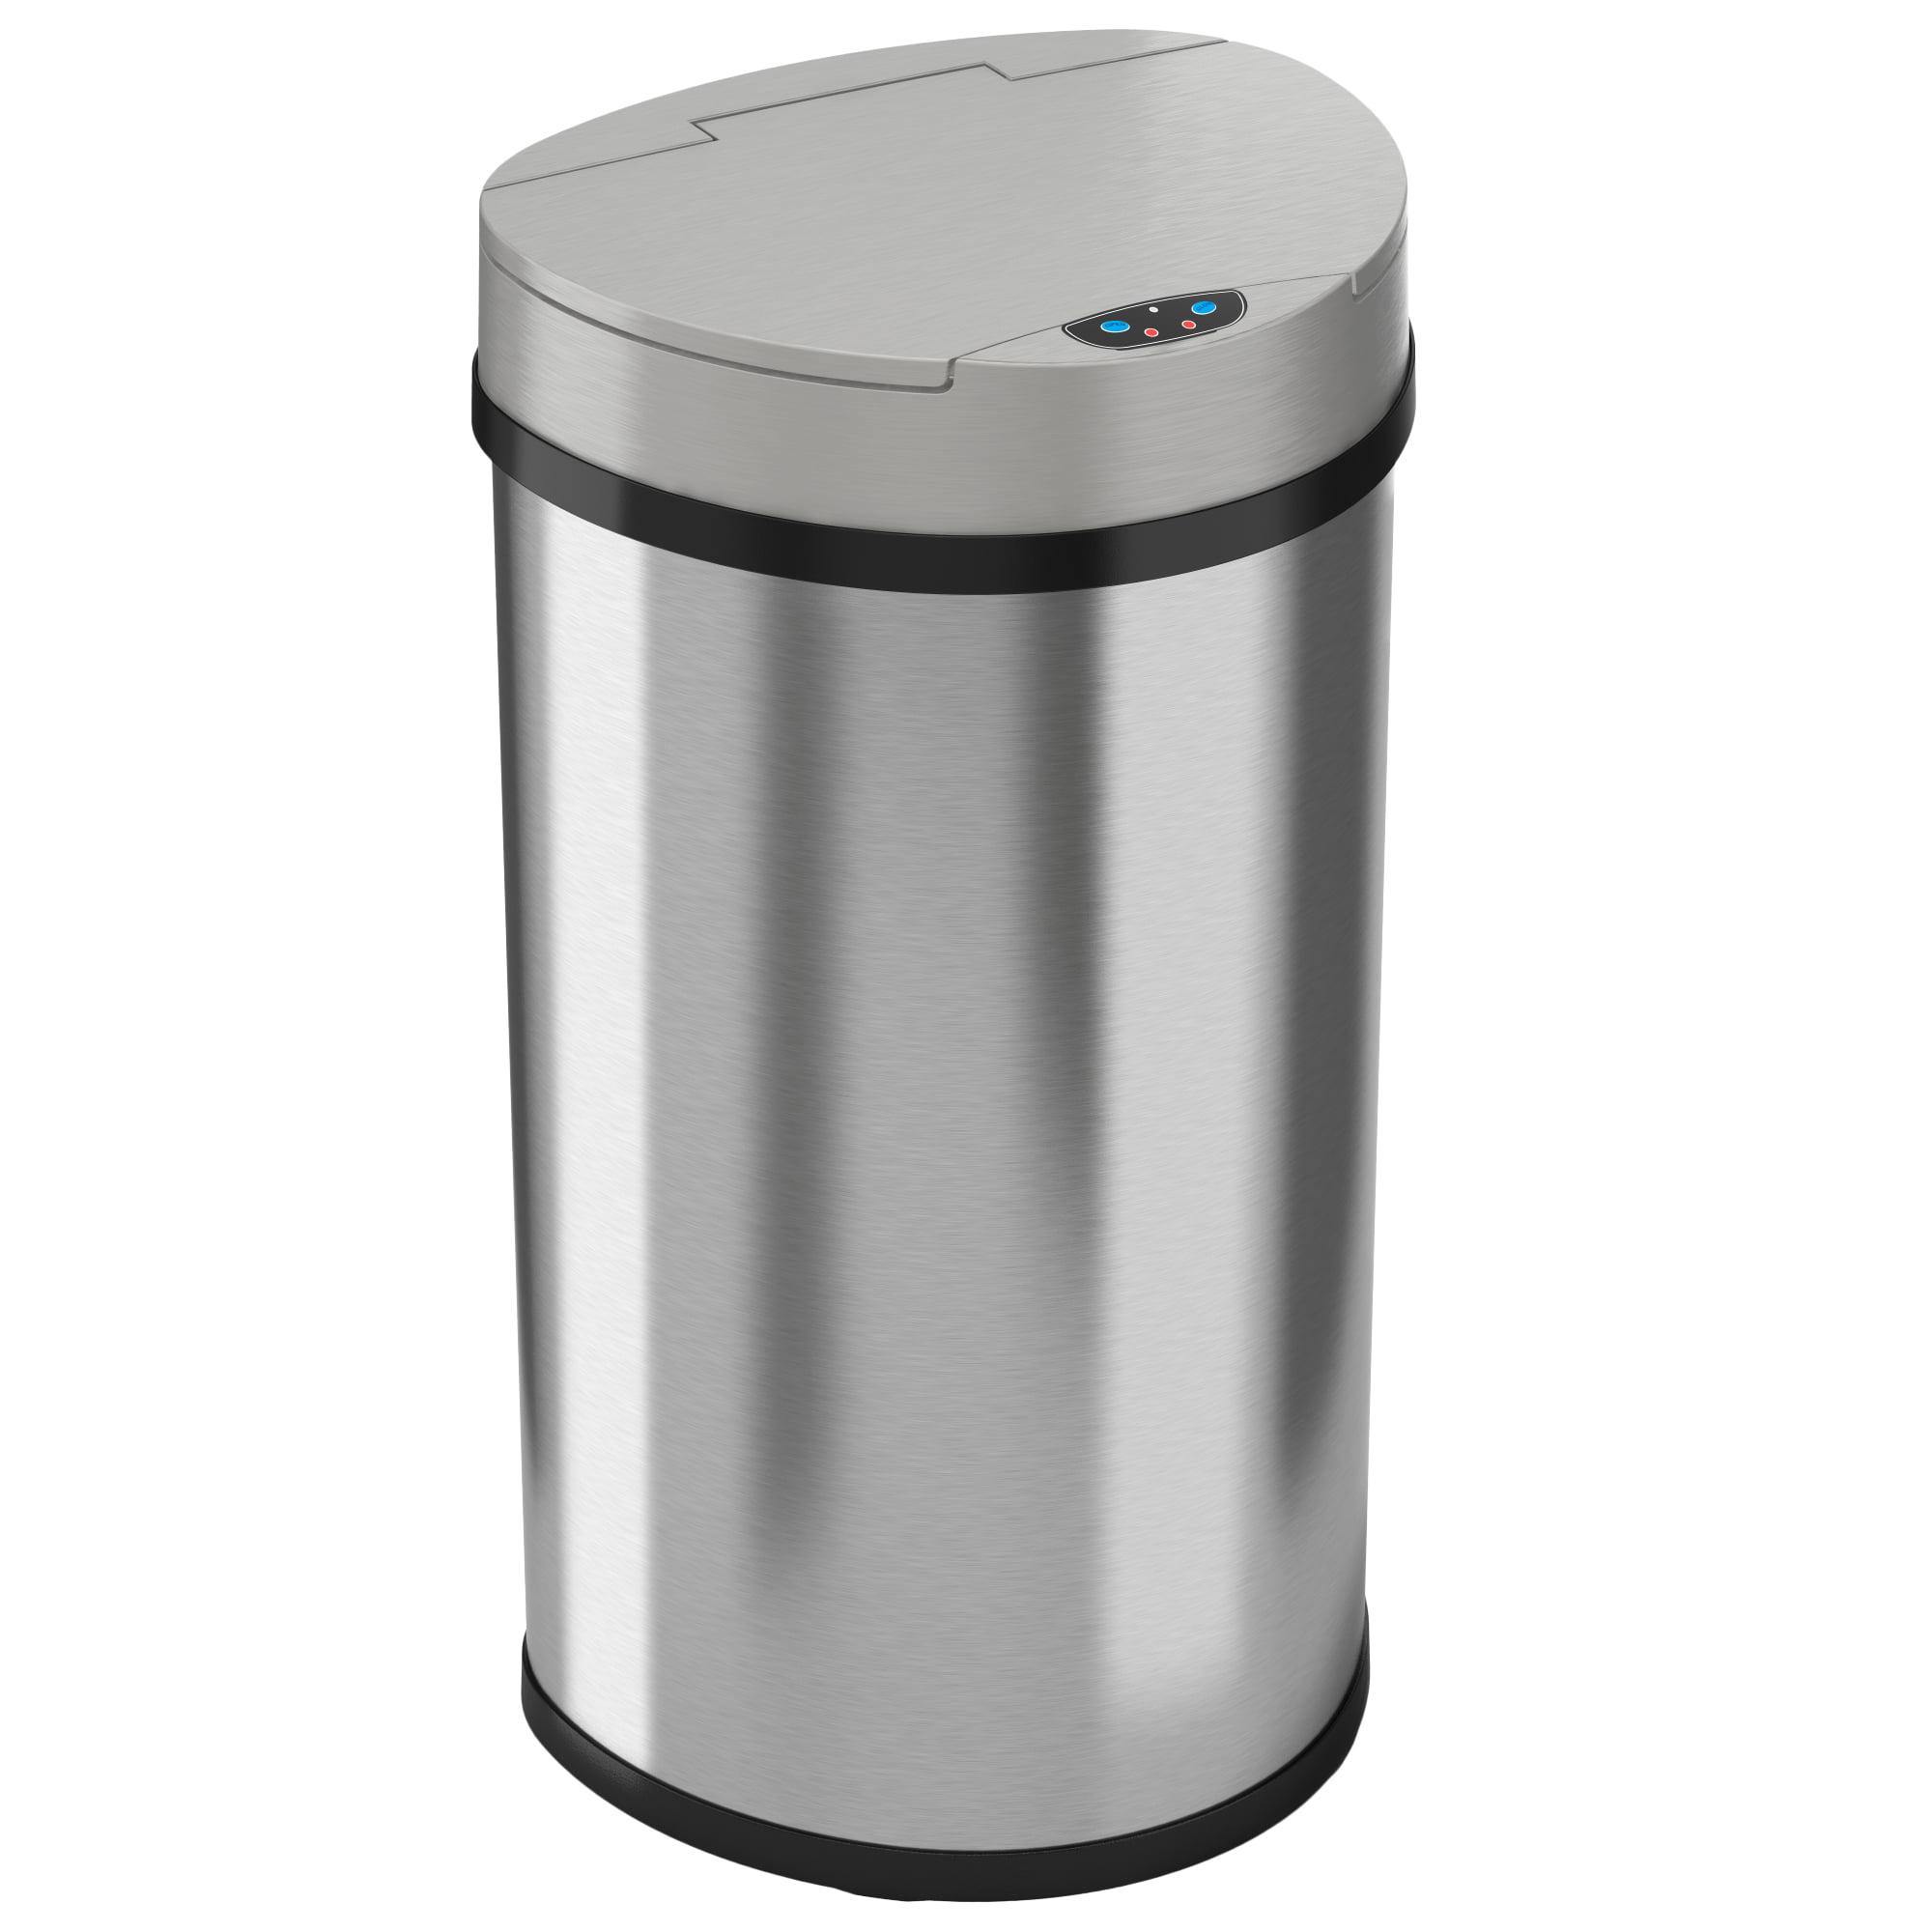 Itouchless 13 Gallon Semi Round Automatic Sensor Trash Can